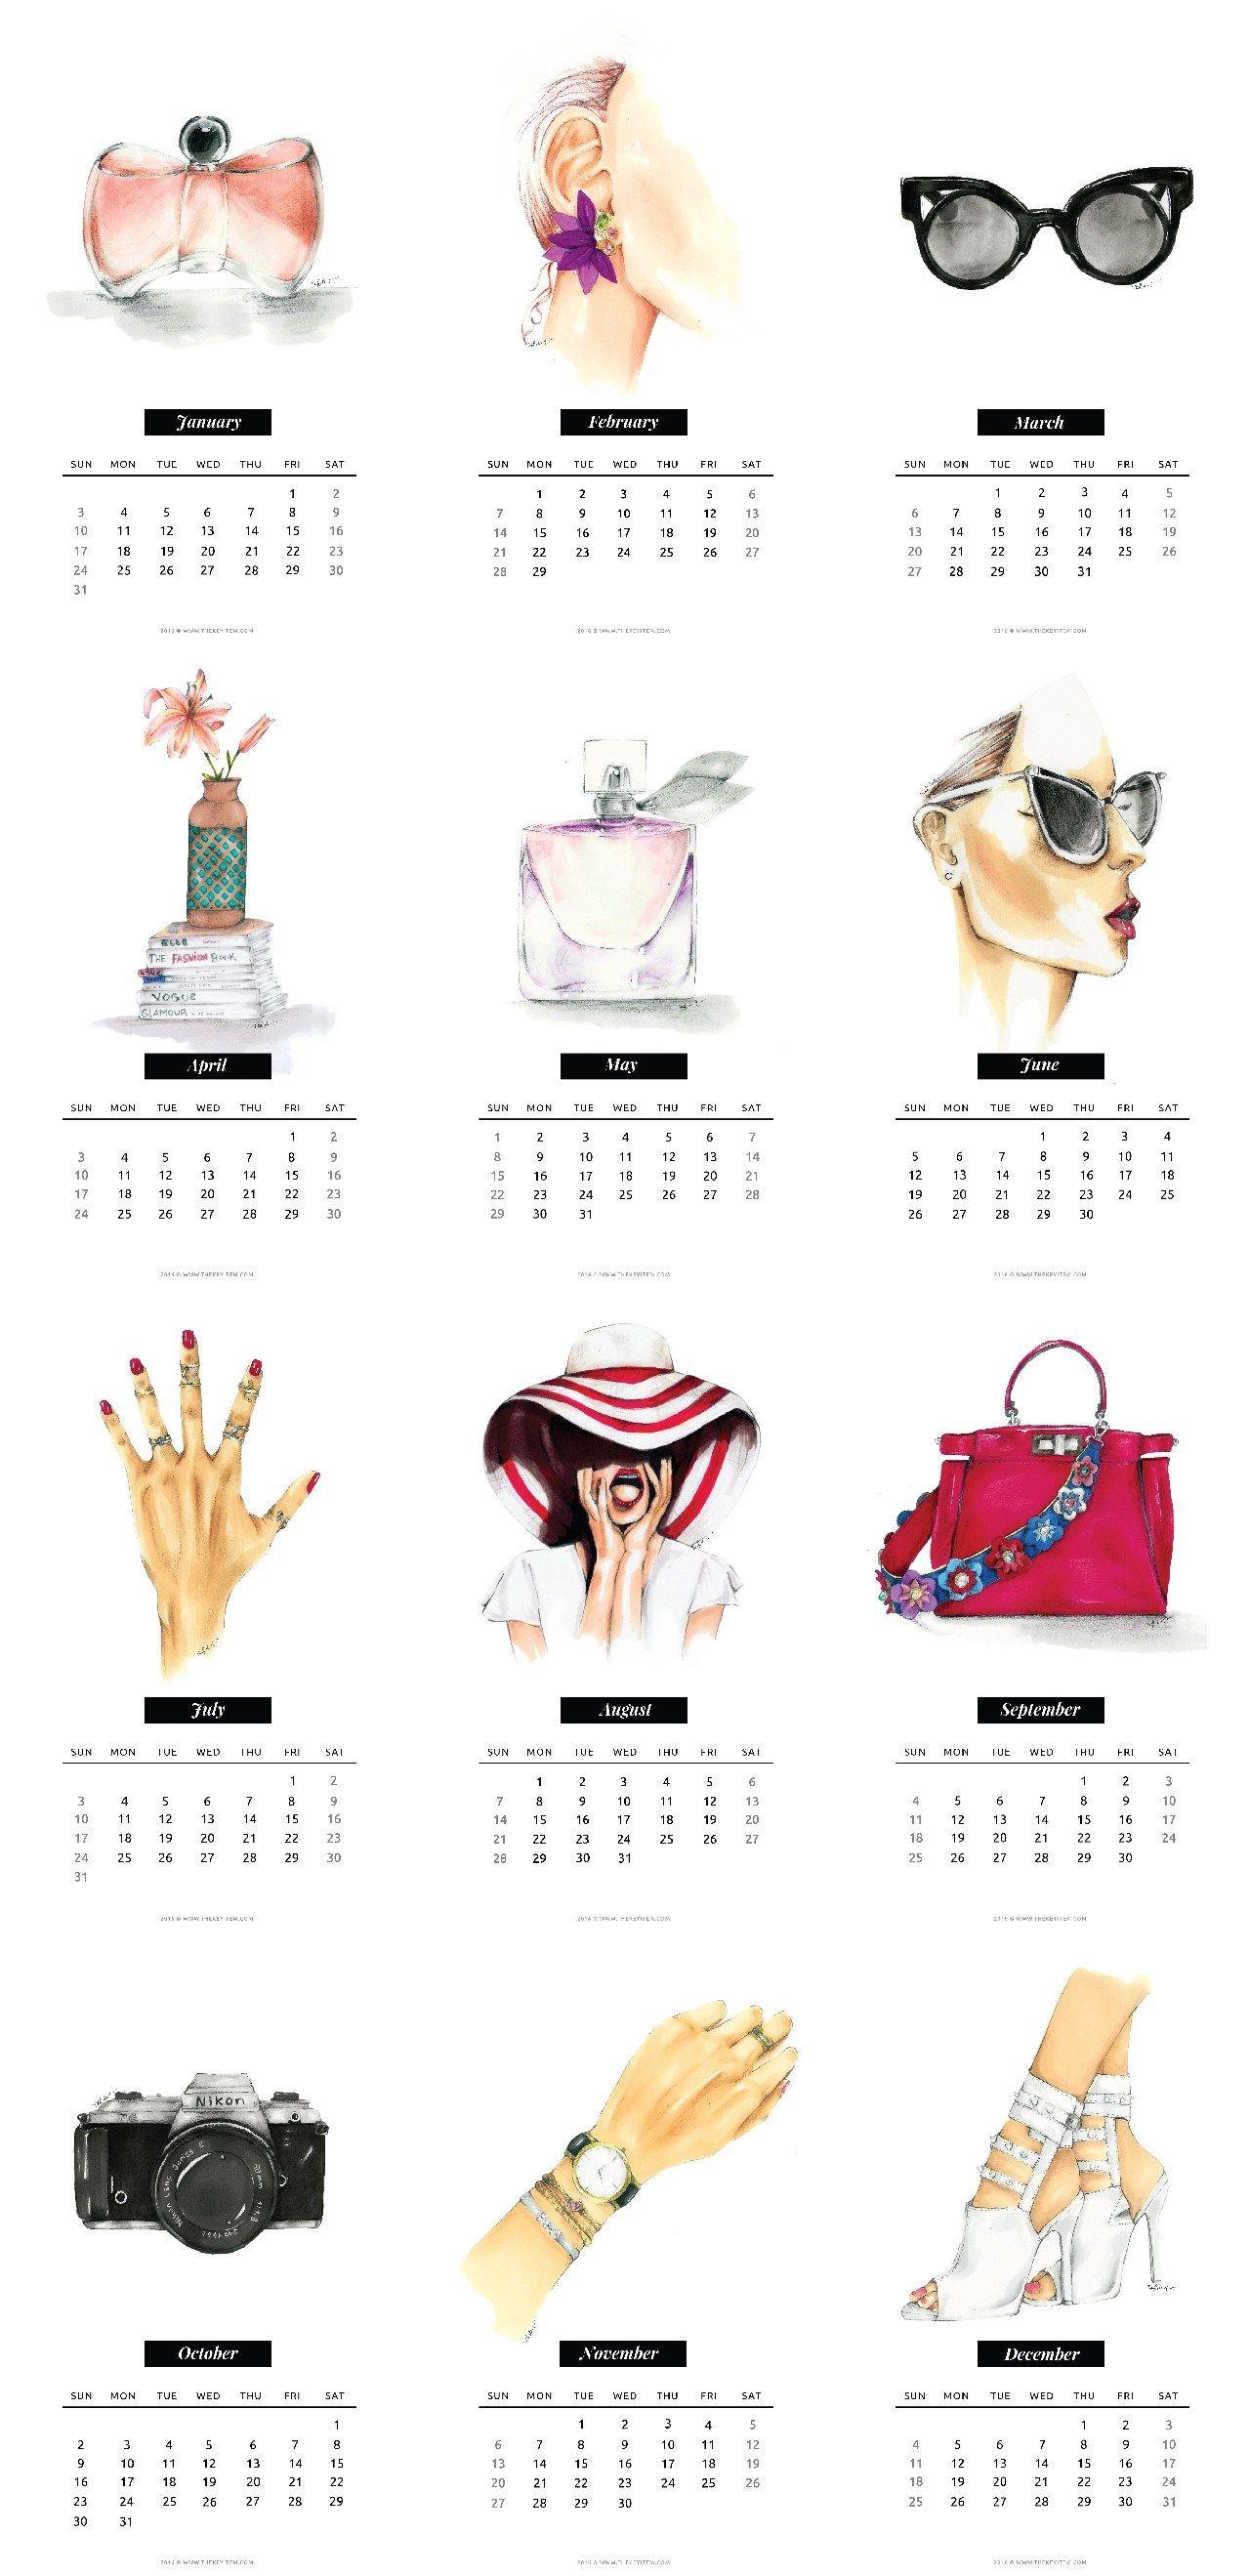 Calendario De 2019 Para Imprimir Gratis Más Caliente Calendario Ilustrado 2016 Gratis Pinterest Of Calendario De 2019 Para Imprimir Gratis Más Actual Calendário 2019 Calendários Pinterest